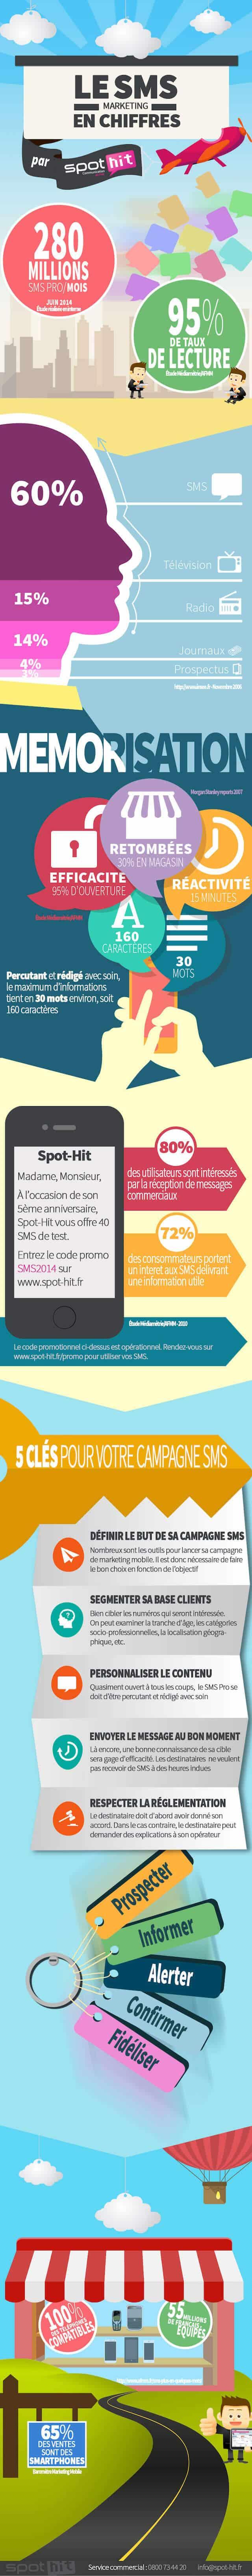 Infographie SMS Pro - Spot Hit